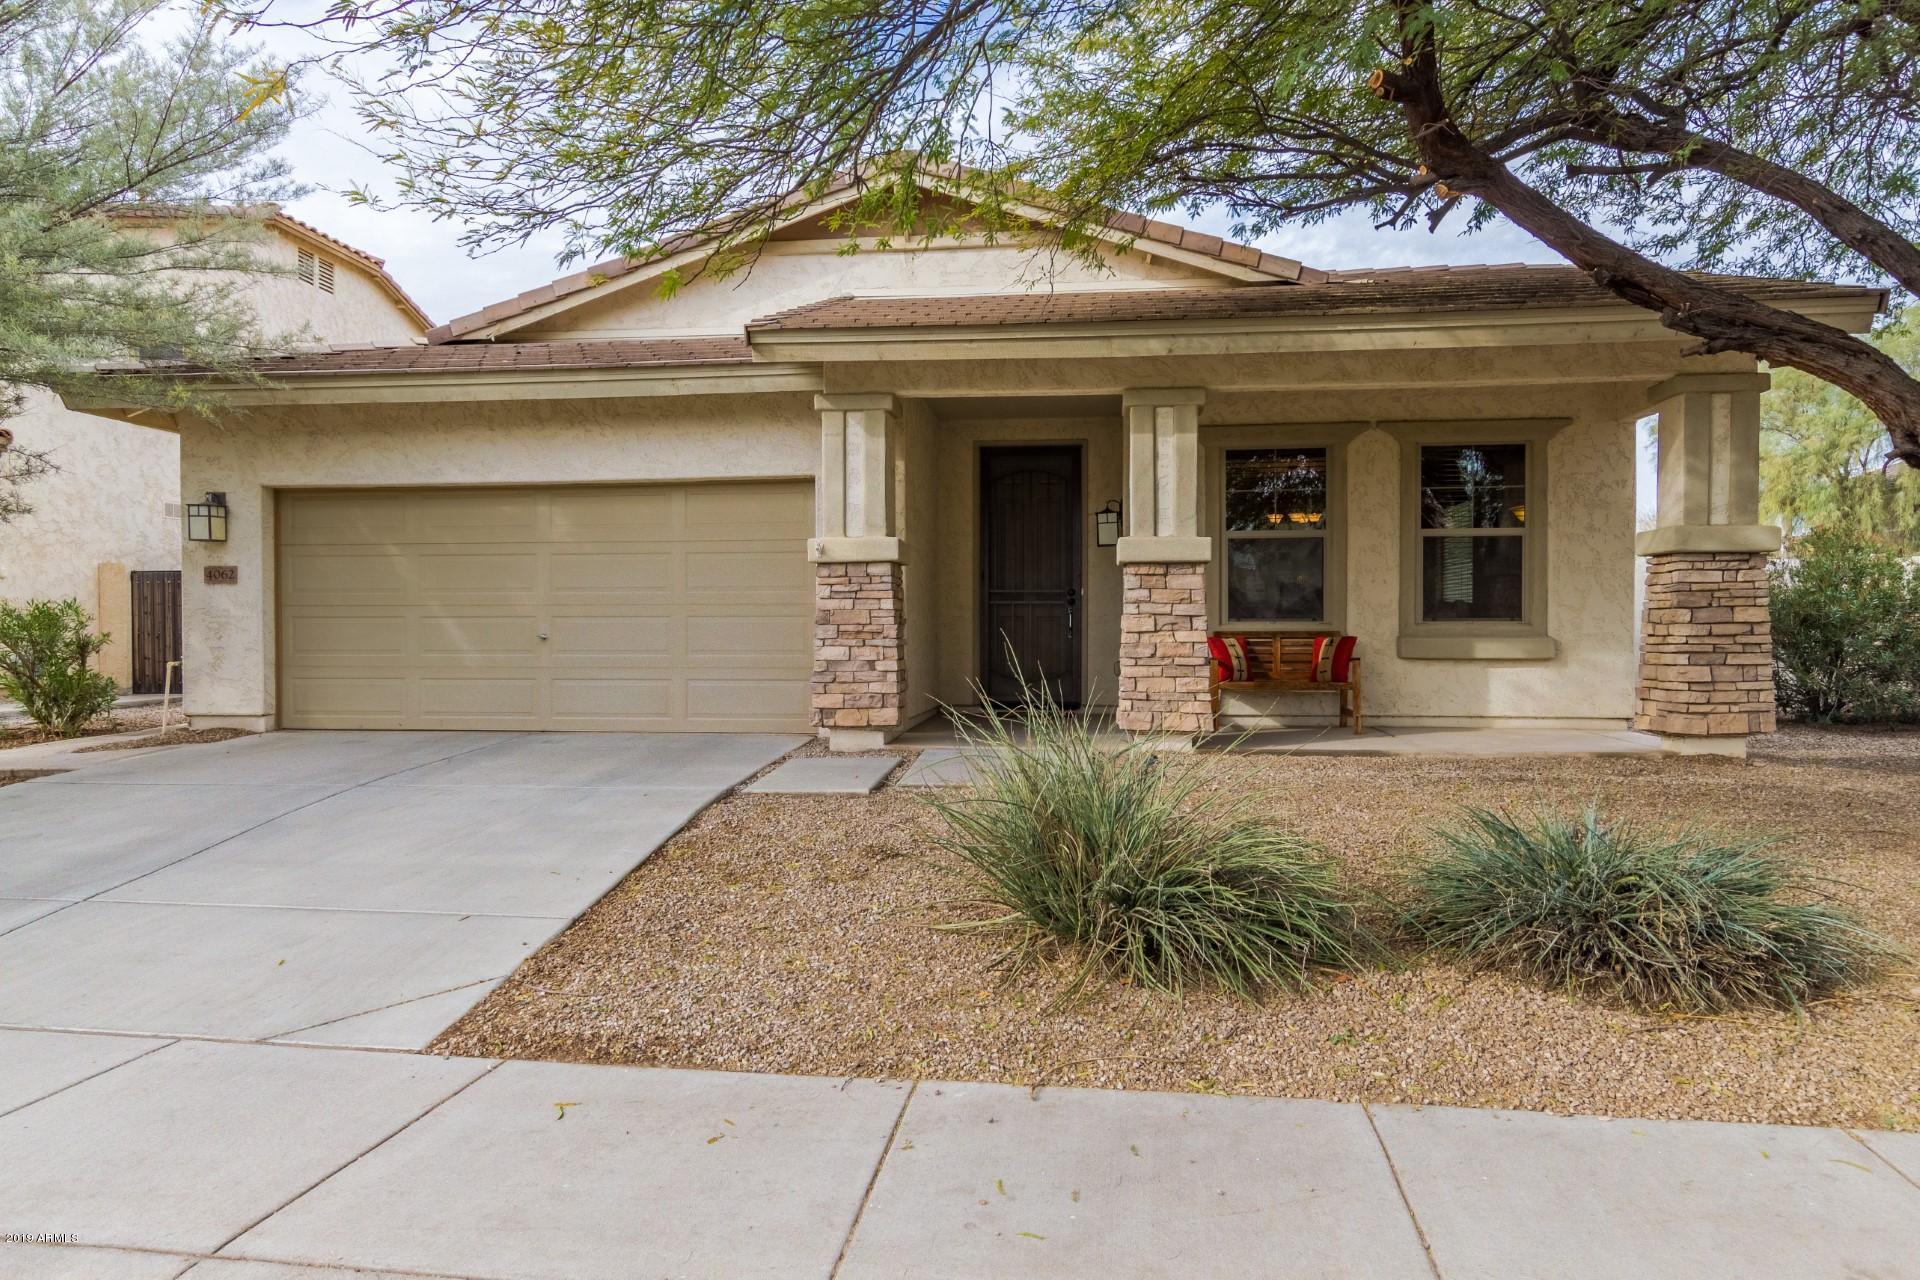 4062 S BRADSHAW Way, Chandler, AZ 85249